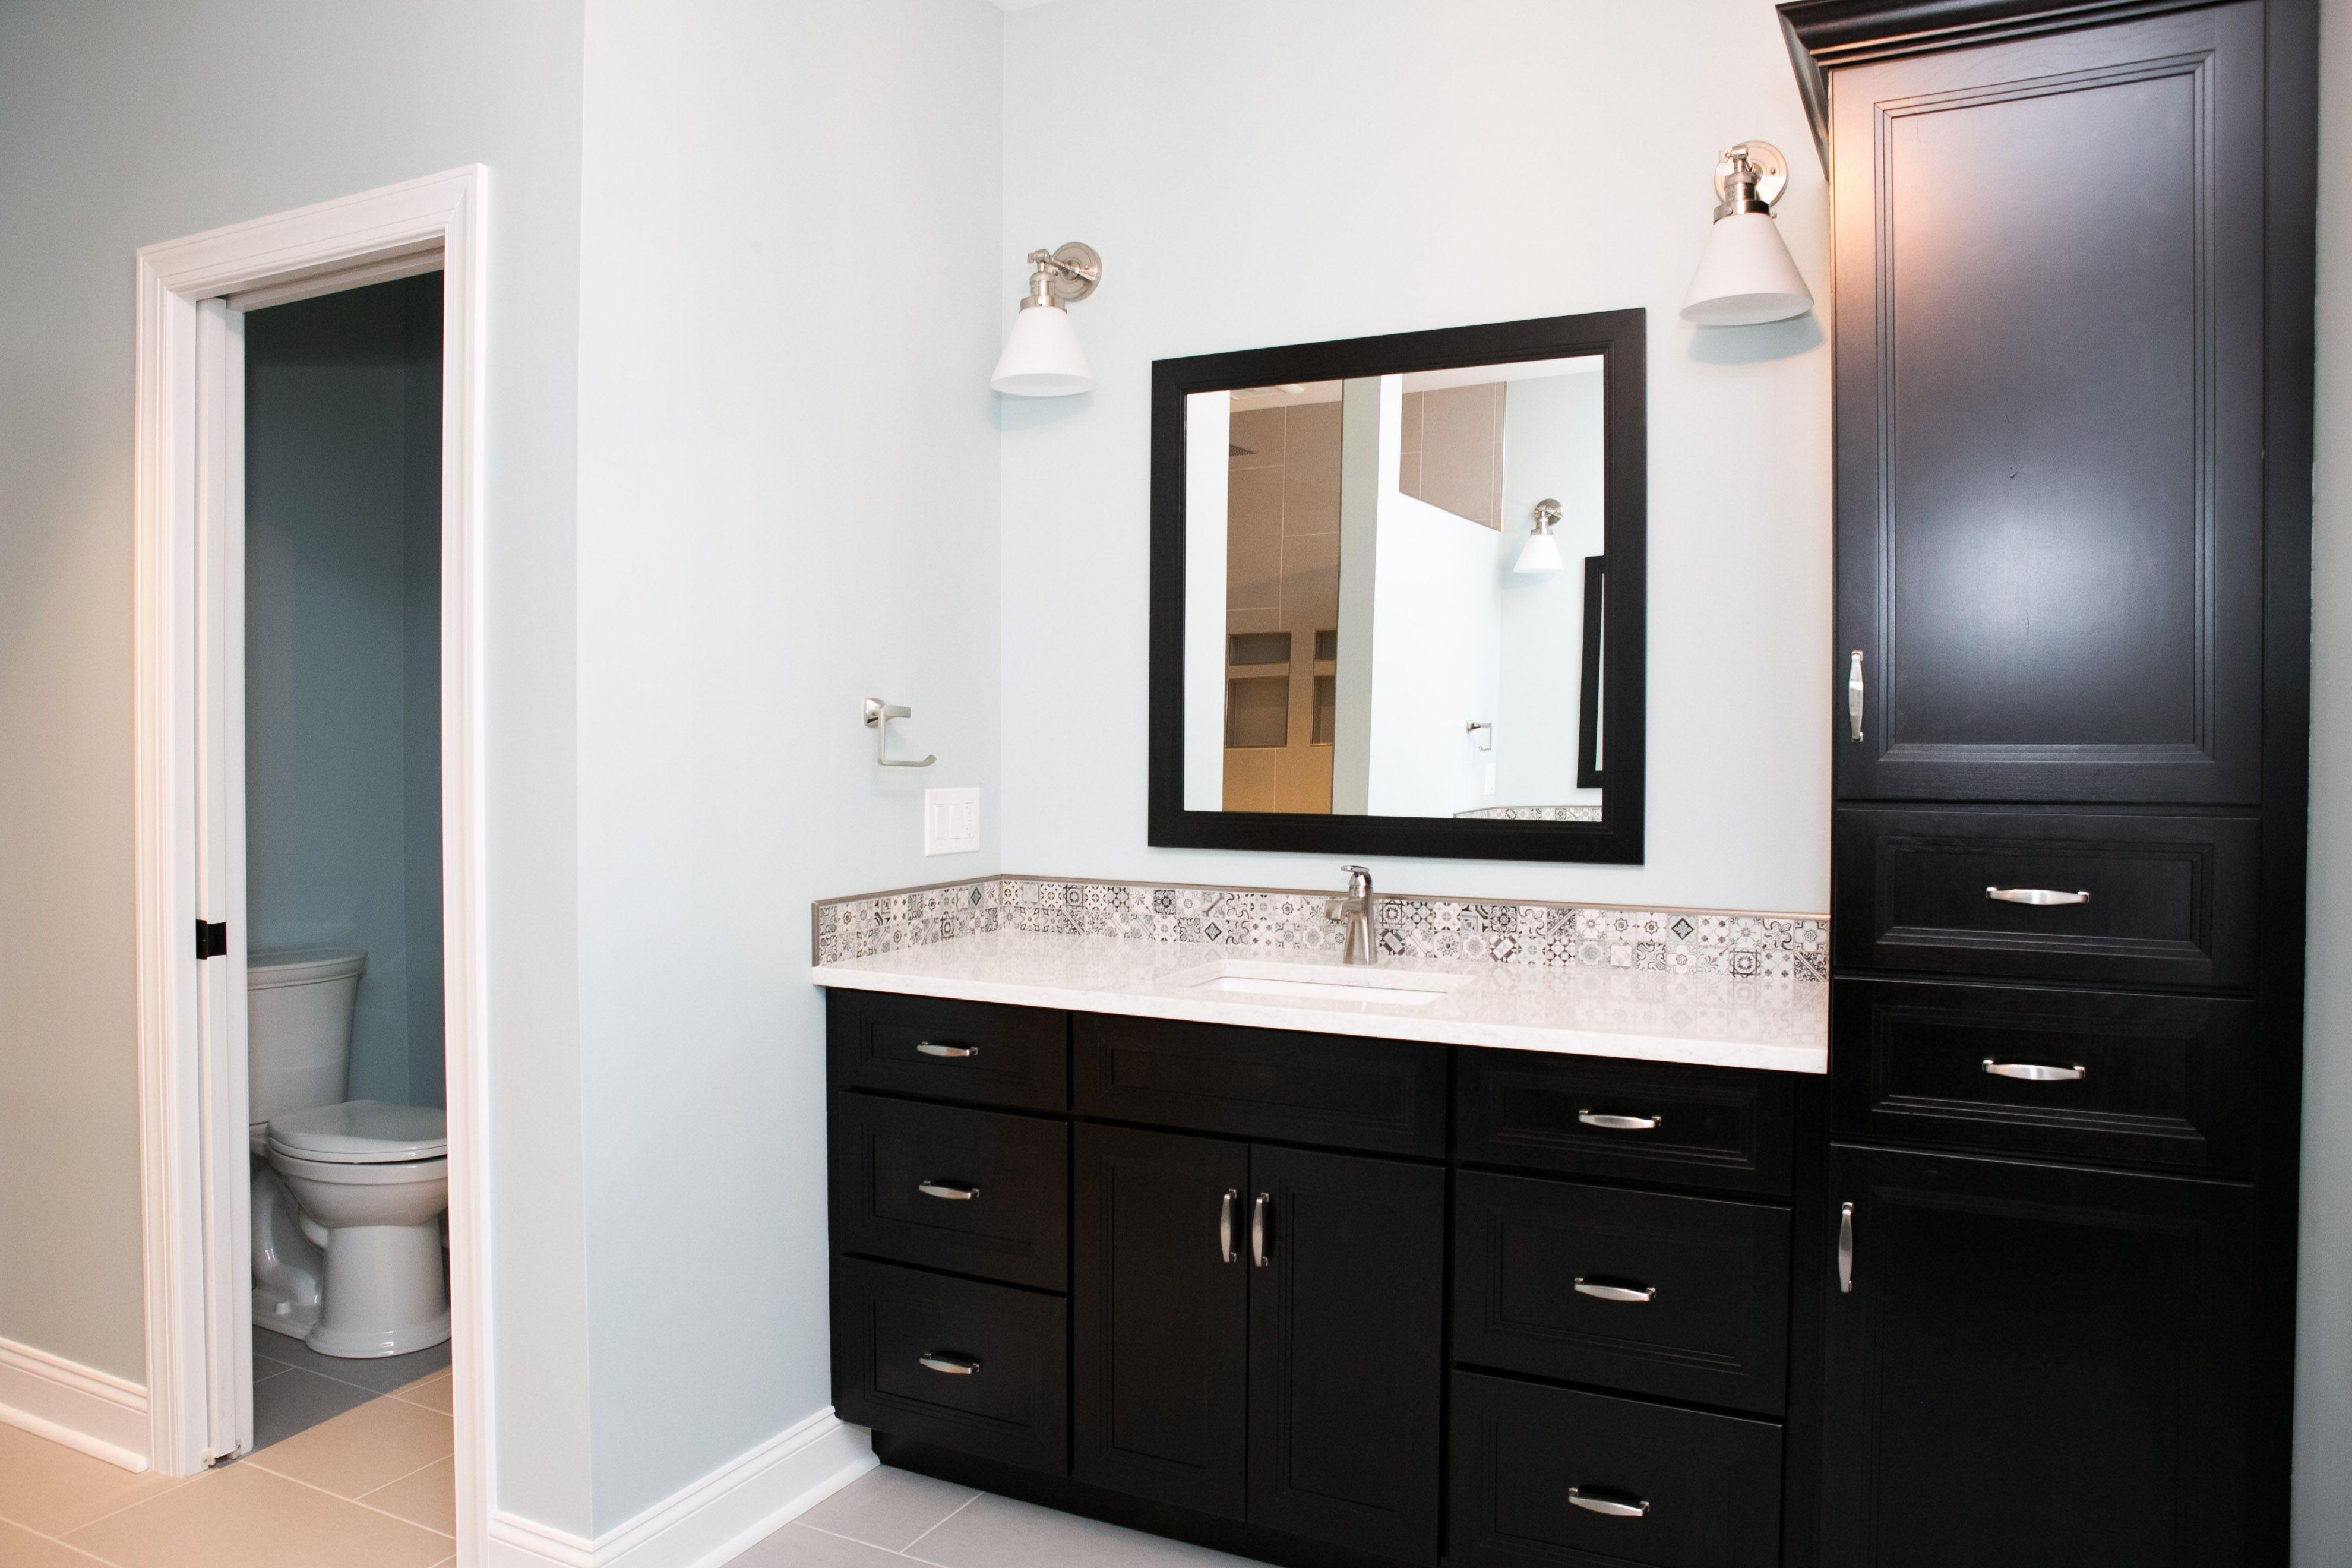 Bathroom Kitchen Cabinets Gr Mitchell York Pa Kitchen Cabinets In Bathroom Kitchen Cabinets Showroom Cabinetry Design